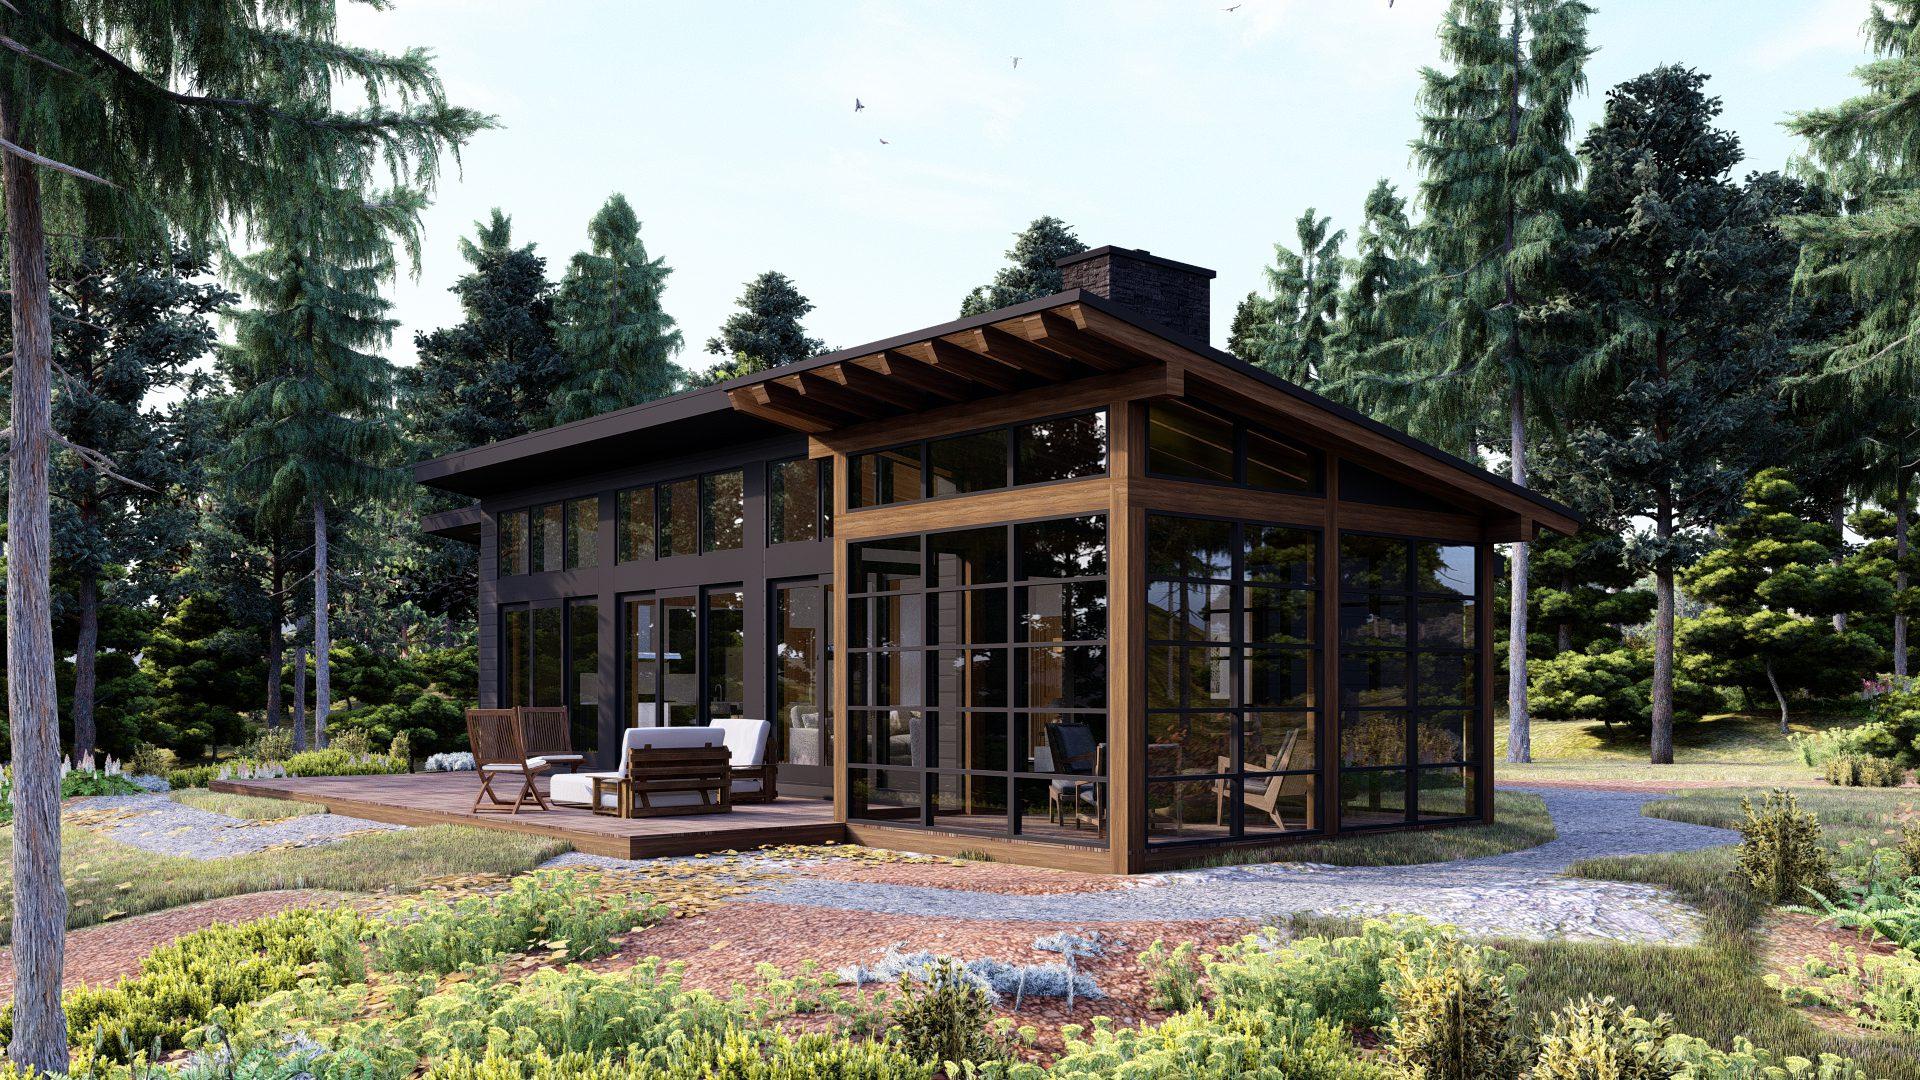 Timber Frame Cottage Designs Plans   The Bayfield 3945   Normerica   Exterior, Back, Porch